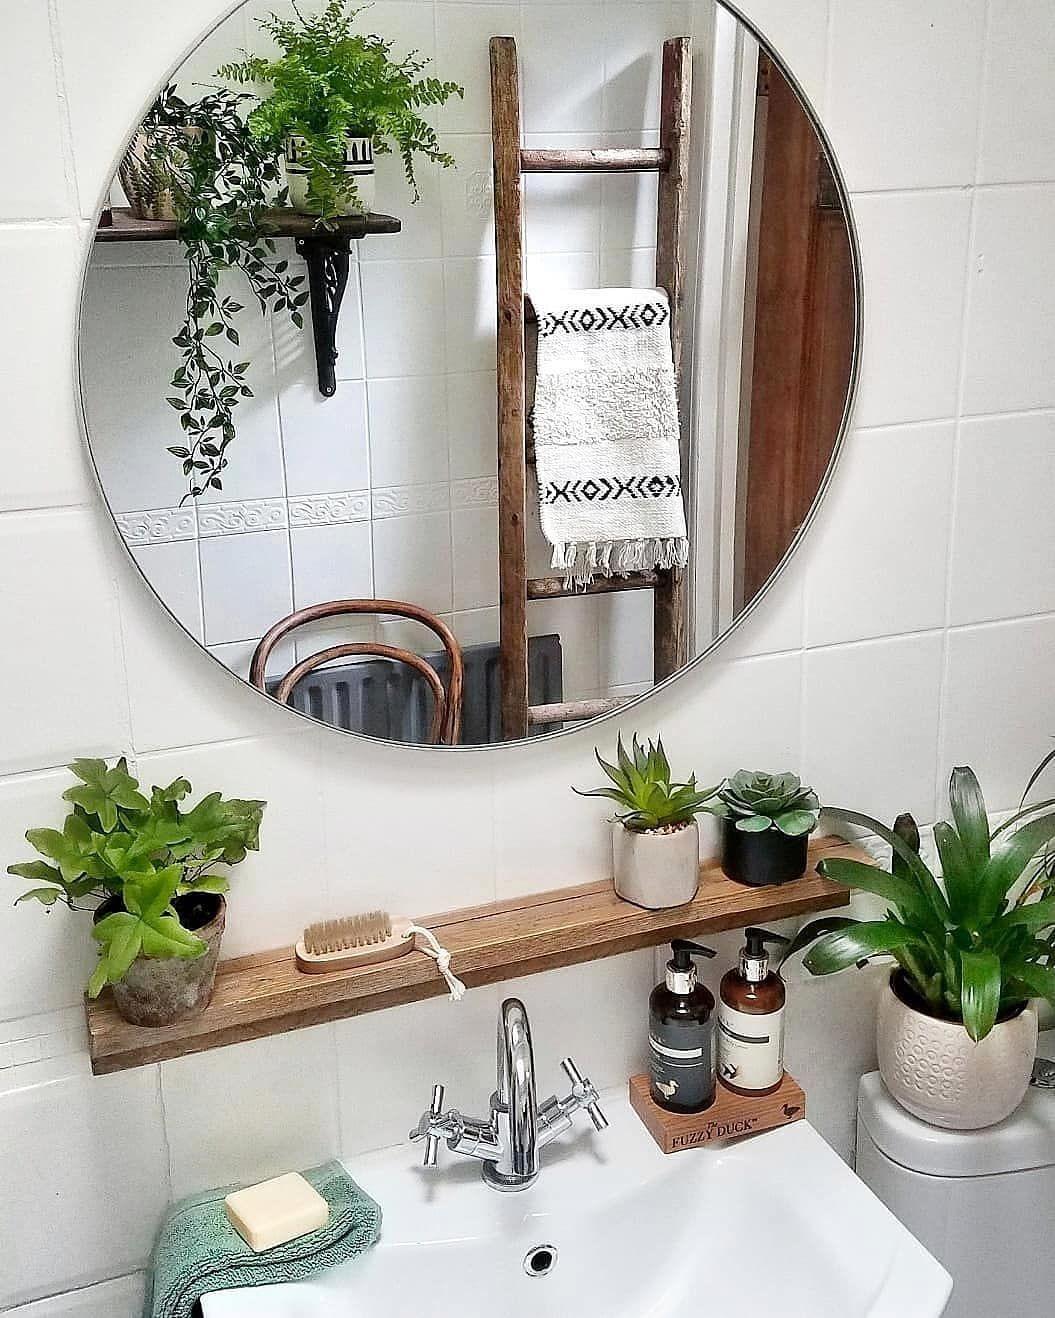 Haus Therapie On Instagram Bathroom Goals Right There Sixat21 Knows Haustherapie Bohemian Style Interior Boho Bathroom Decor Duck hunting bathroom decor